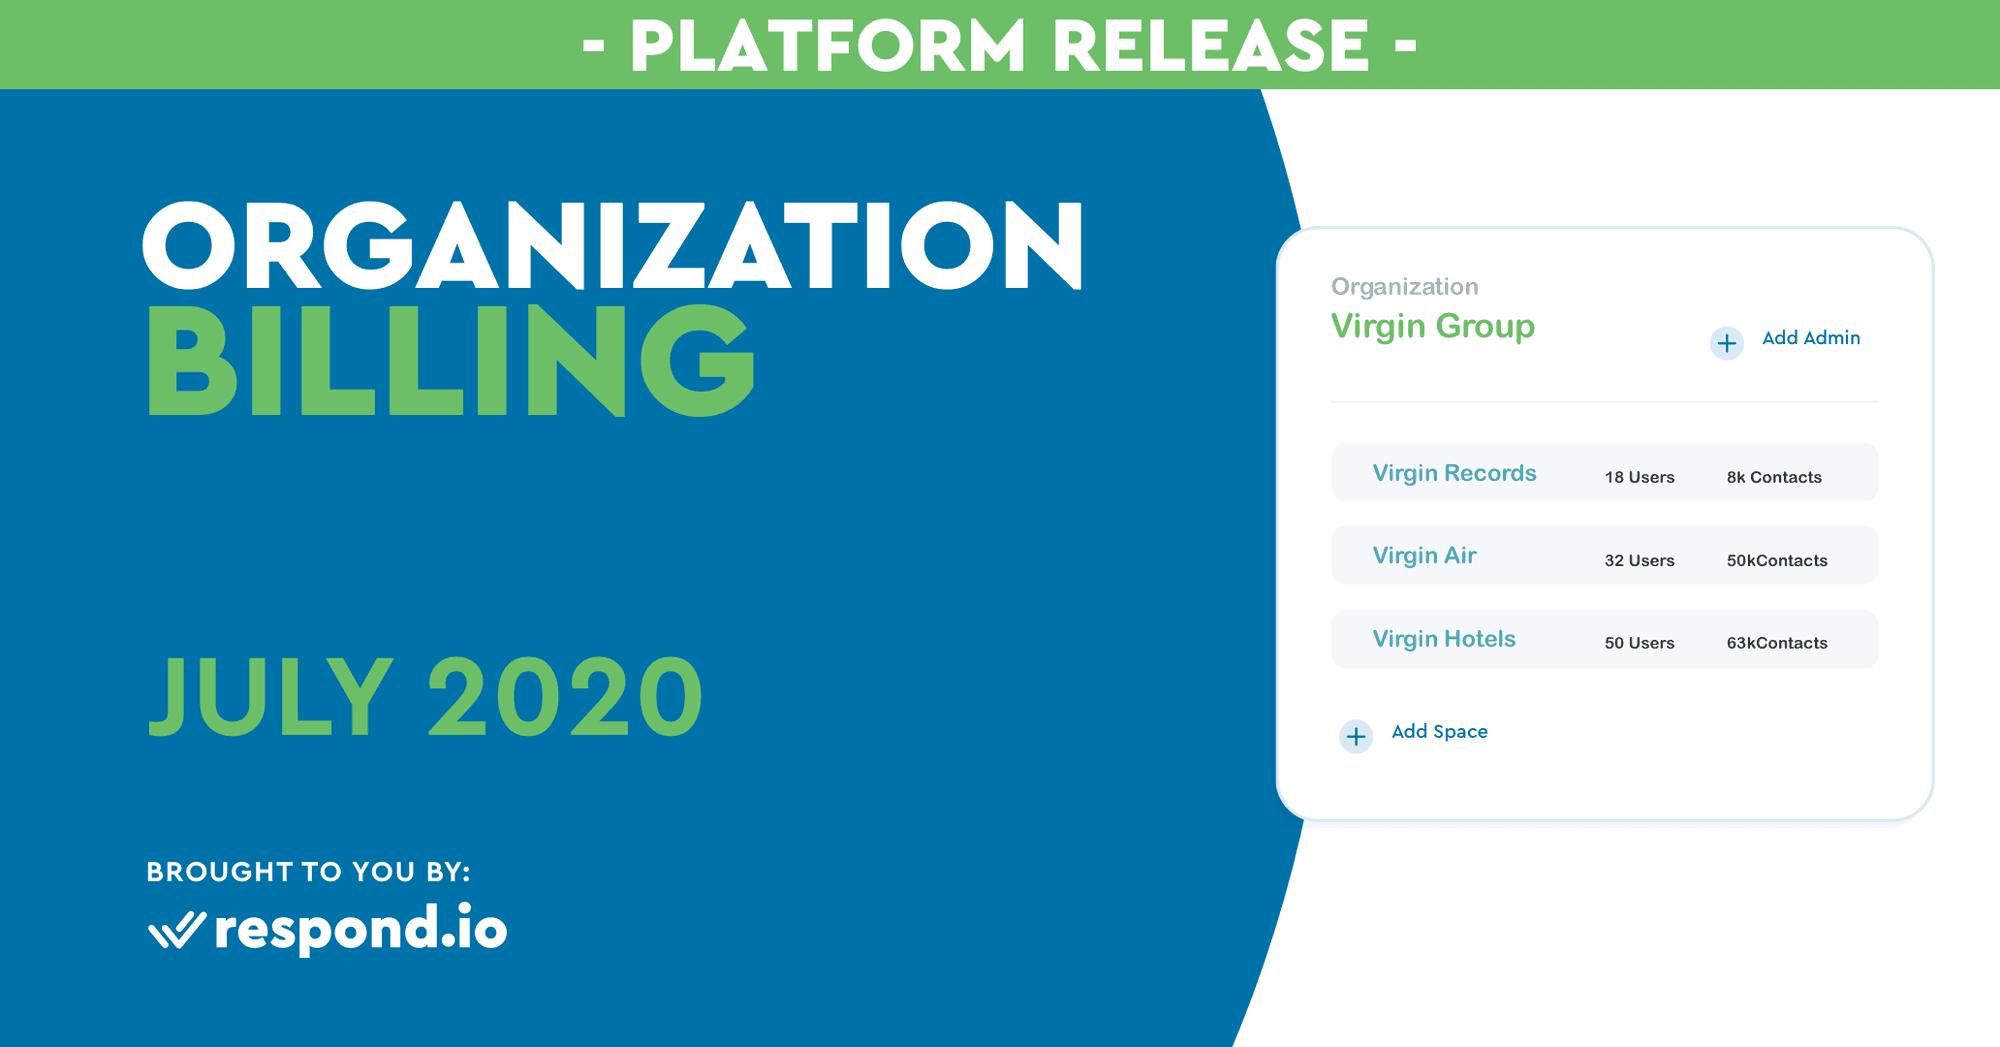 The July 2020 Release - Organizational Billing